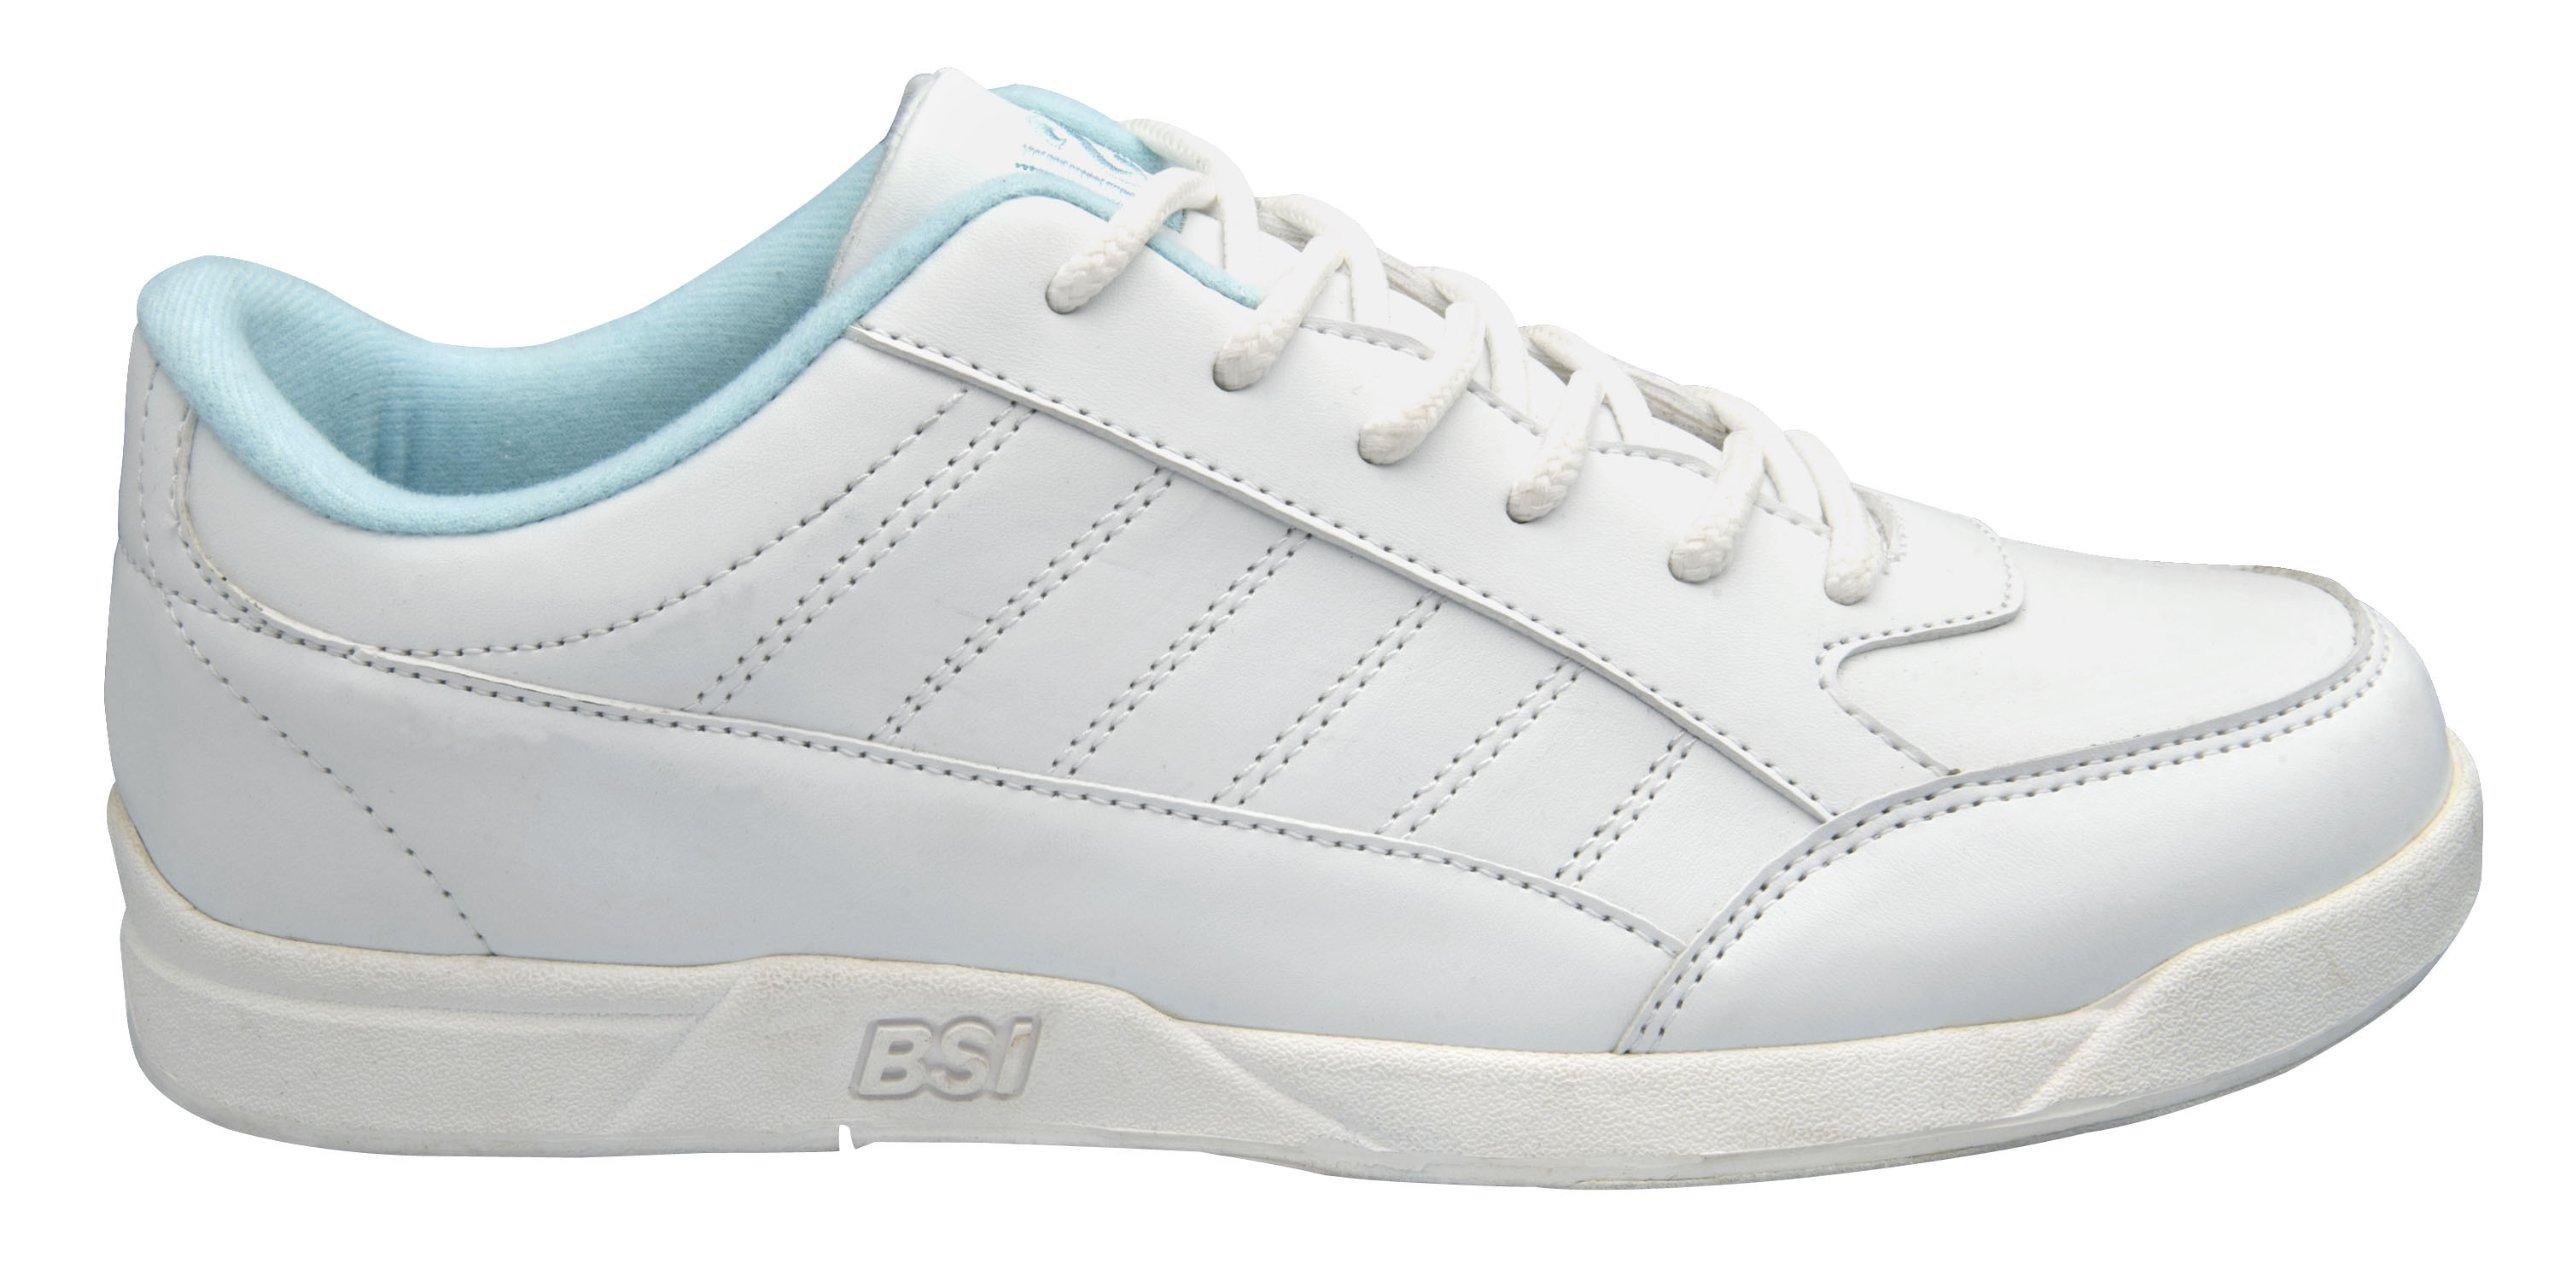 BSI Women's 422 Bowling Shoe, White/Blue, Size 9 by BSI (Image #1)